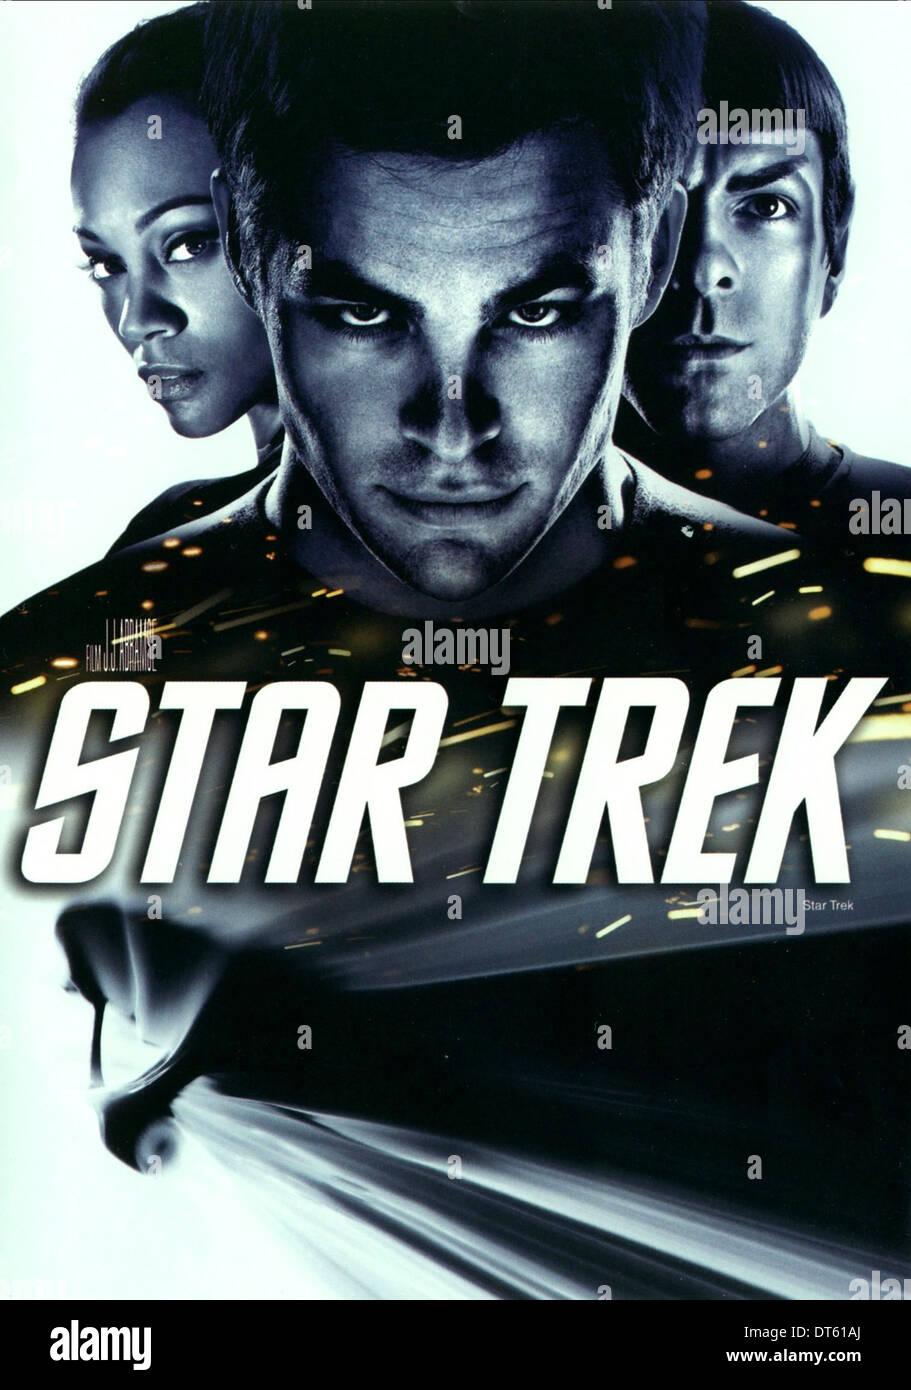 Spock movies gif on gifer by mazukazahn.